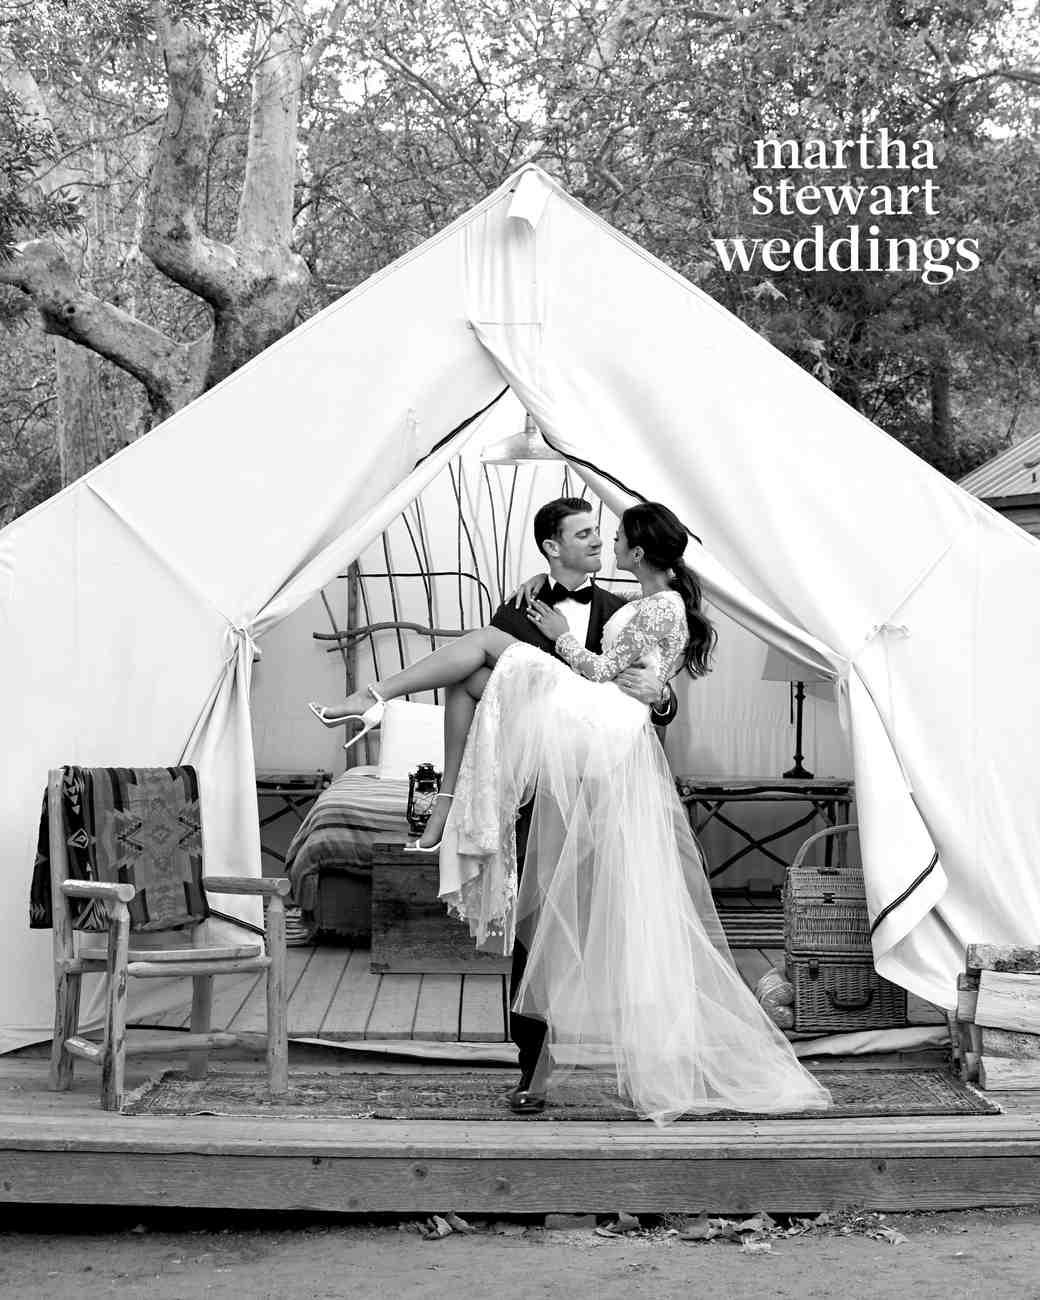 jamie-bryan-wedding-24-tent-couple-3138-d112664.jpg